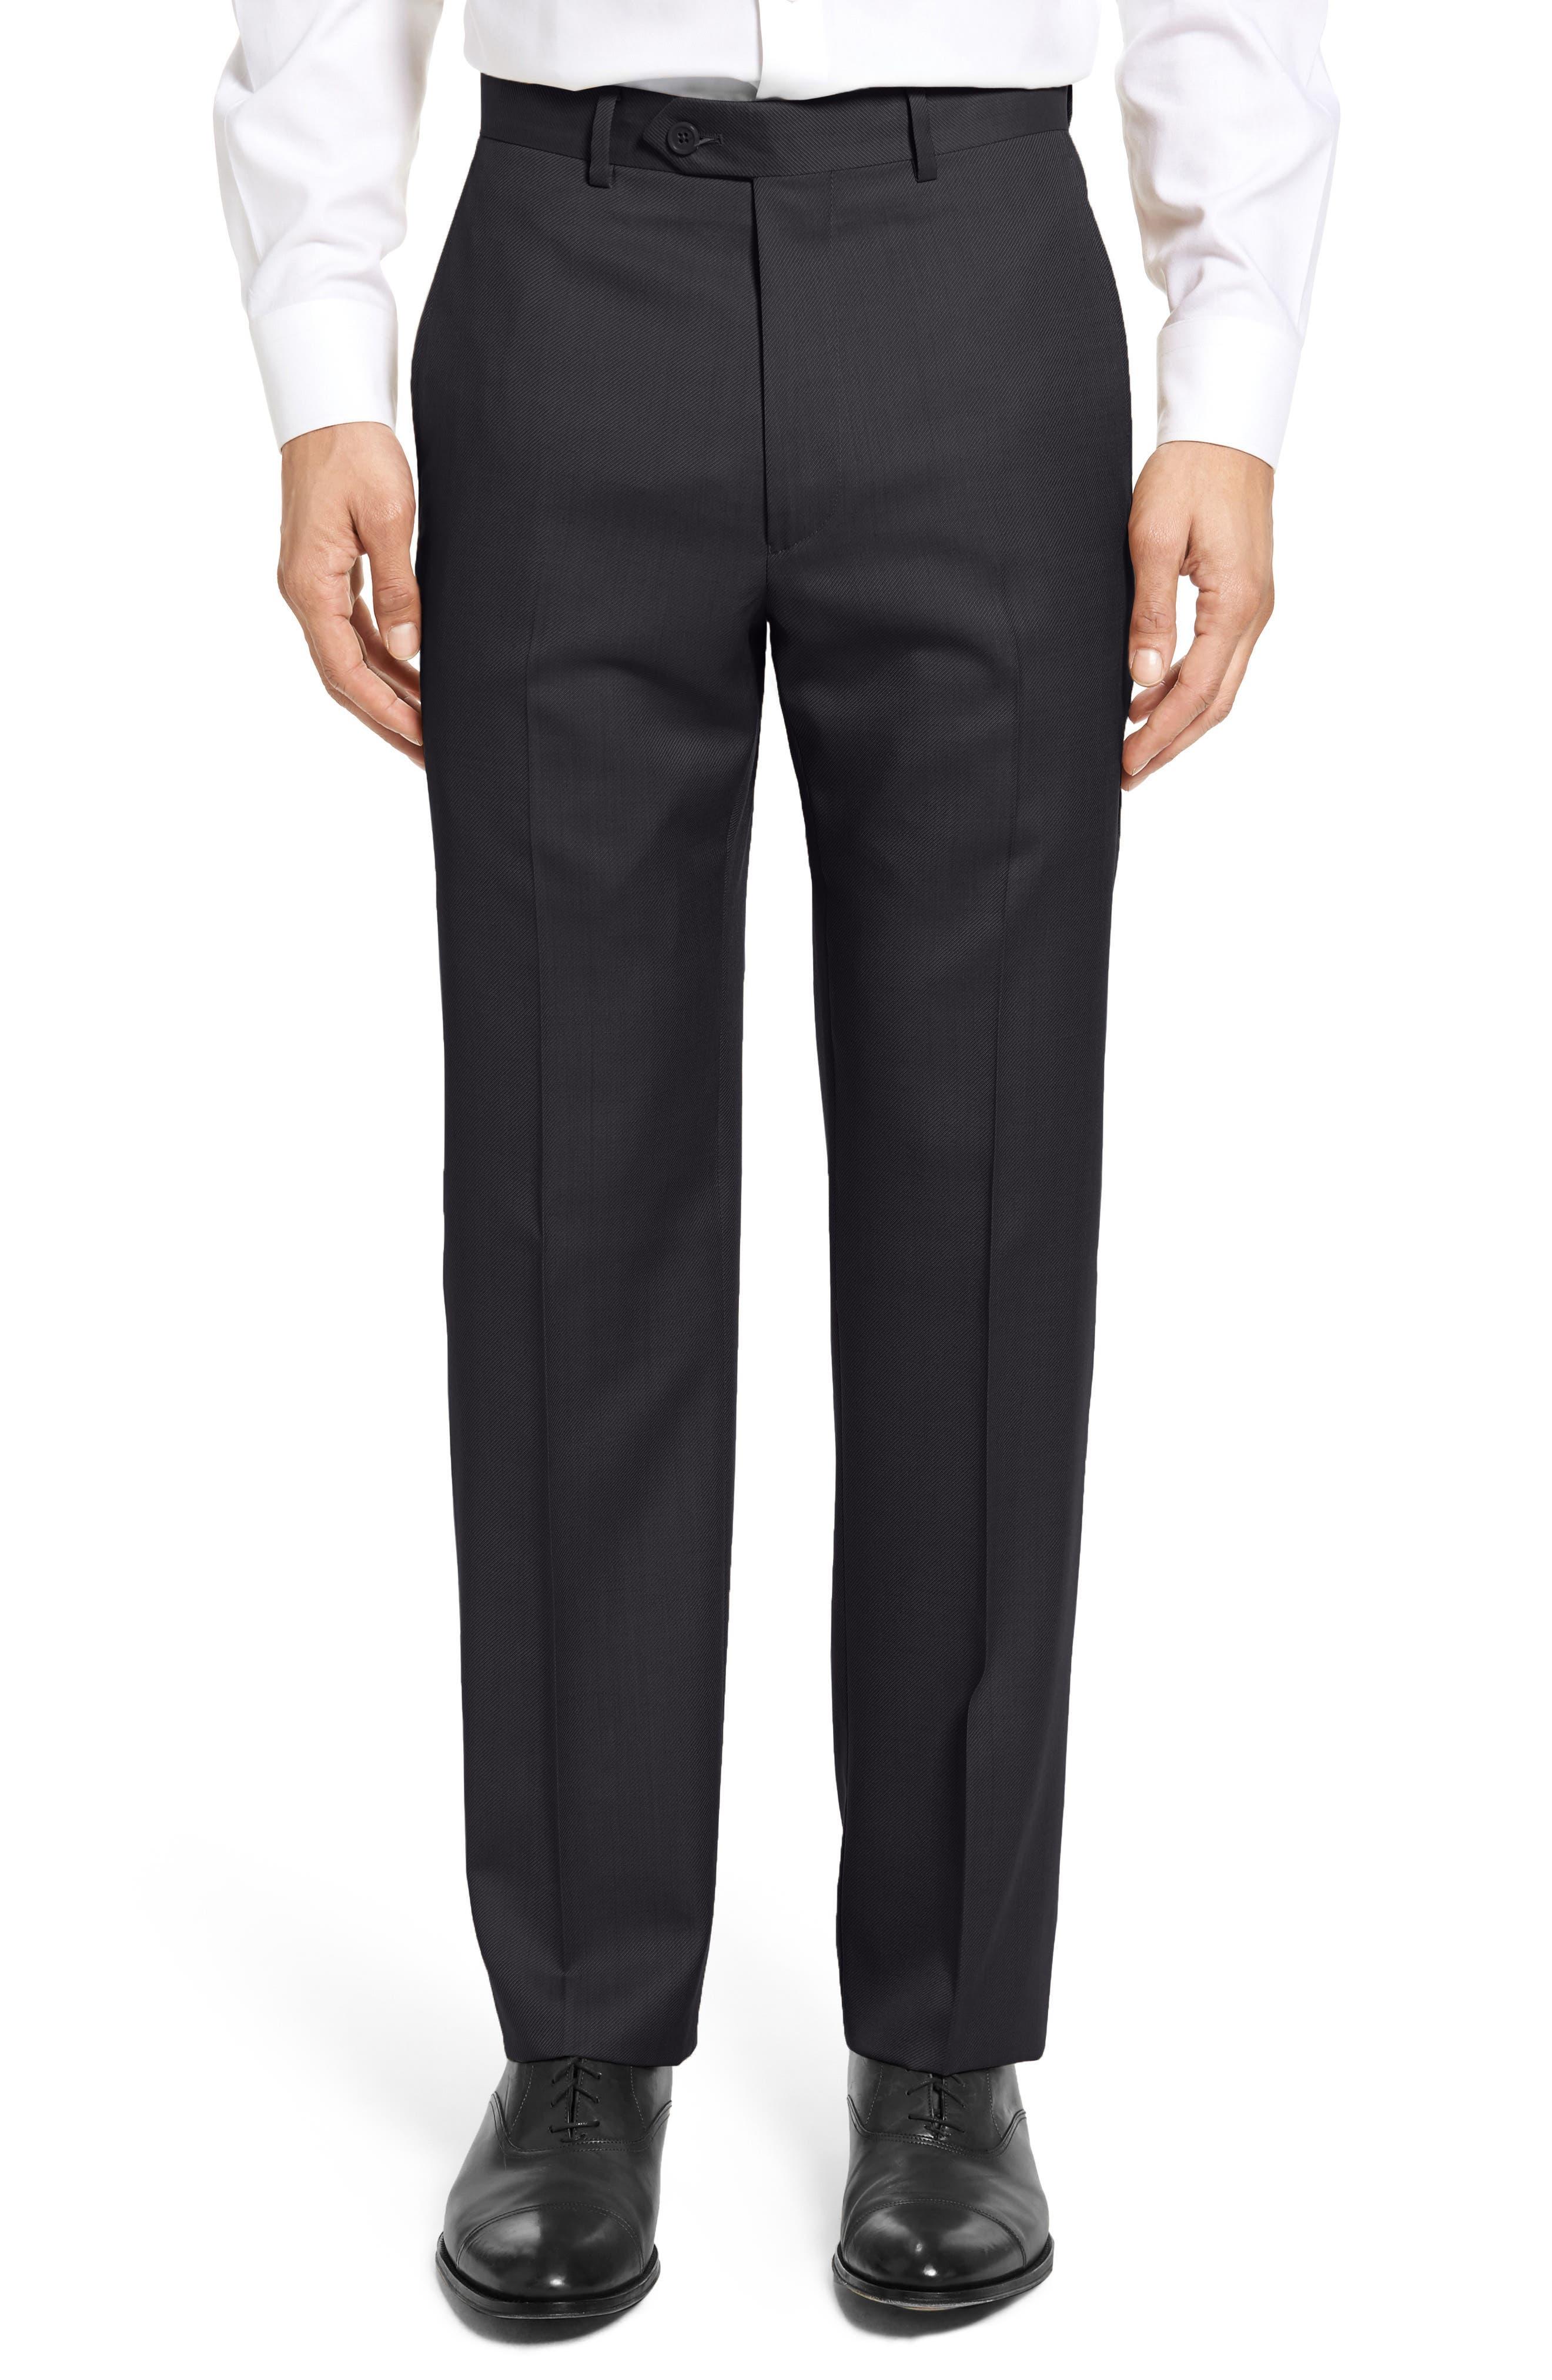 SANTORELLI Flat Front Twill Wool Trousers in Black